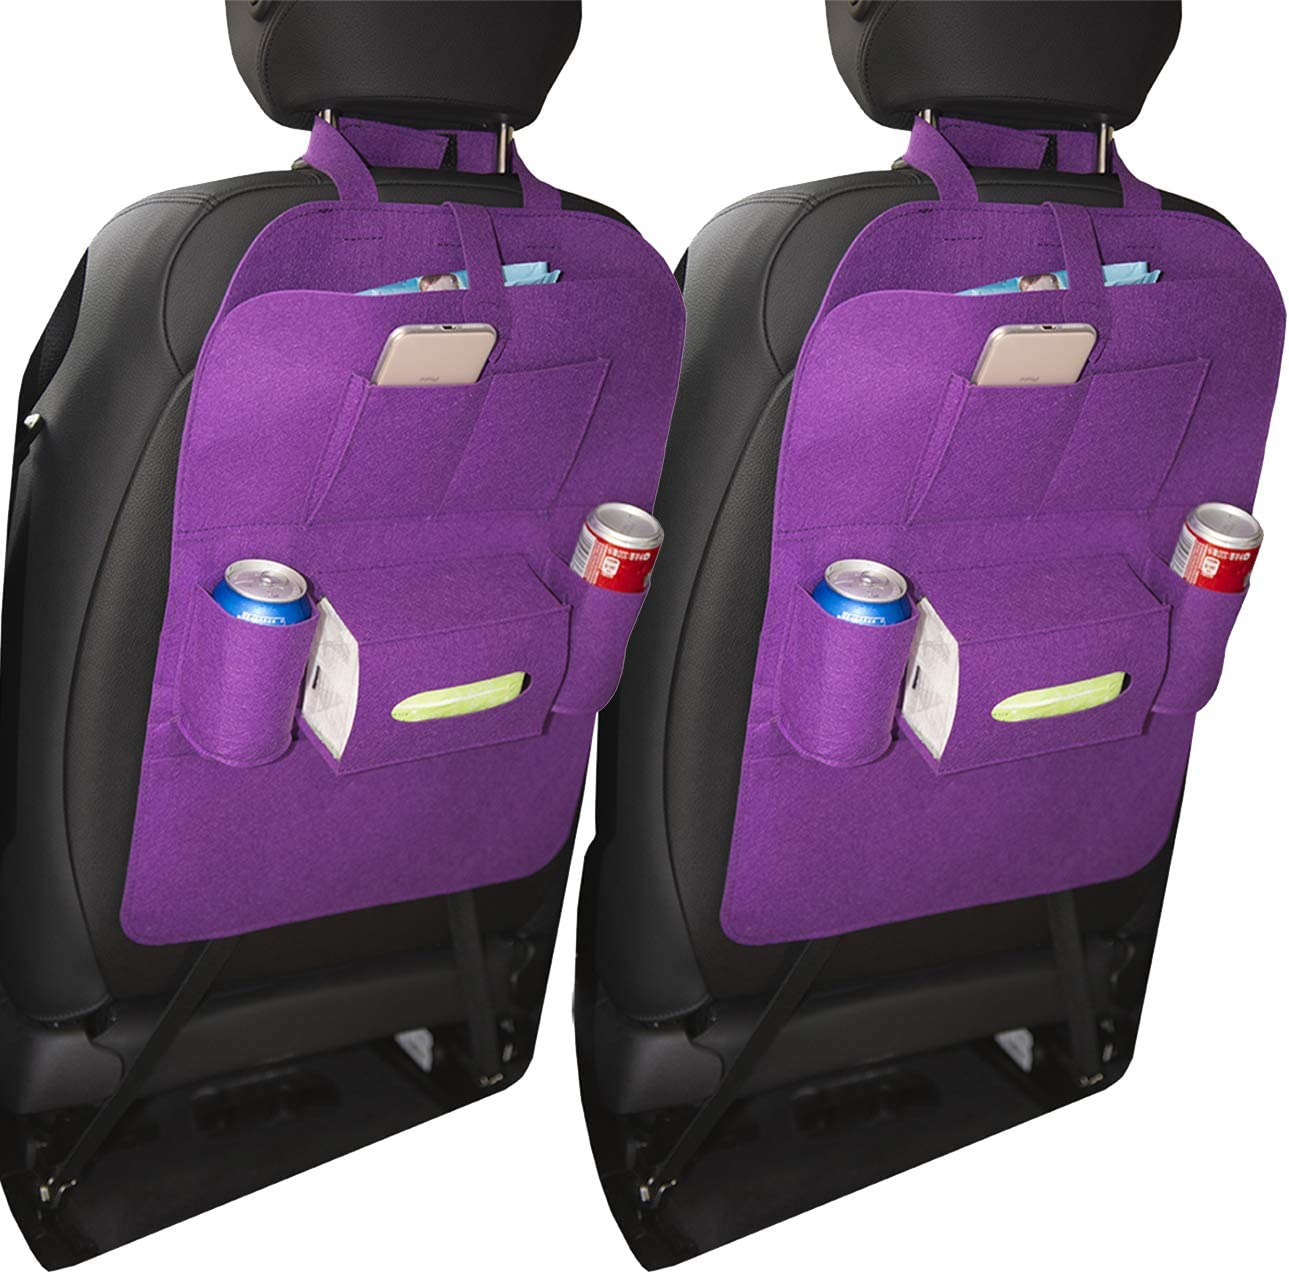 2 Pack, Black Uheng Car Back Seat Organizer Backseat Organizer Baby Kids Kick Mats Car Protector with 7 Multi Pocket Storage Bag Holder for iPad Tablet Bottle Drink Tissue Box Toys